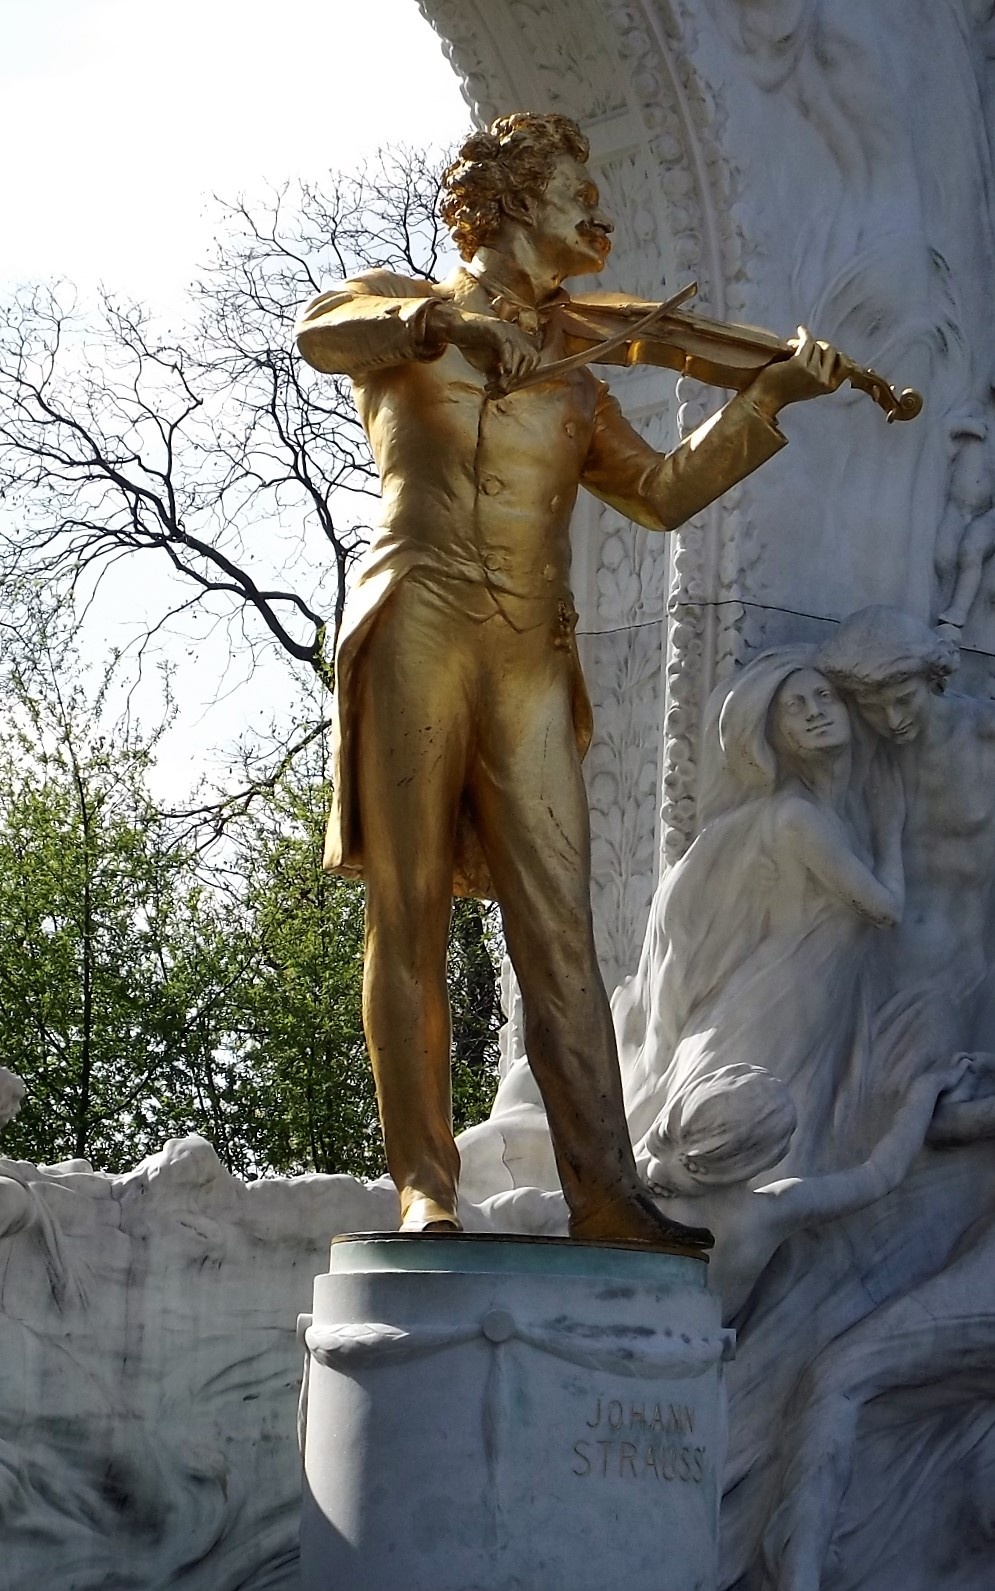 Johan Straus`s statue- Wiena park by Sindbad Traveller